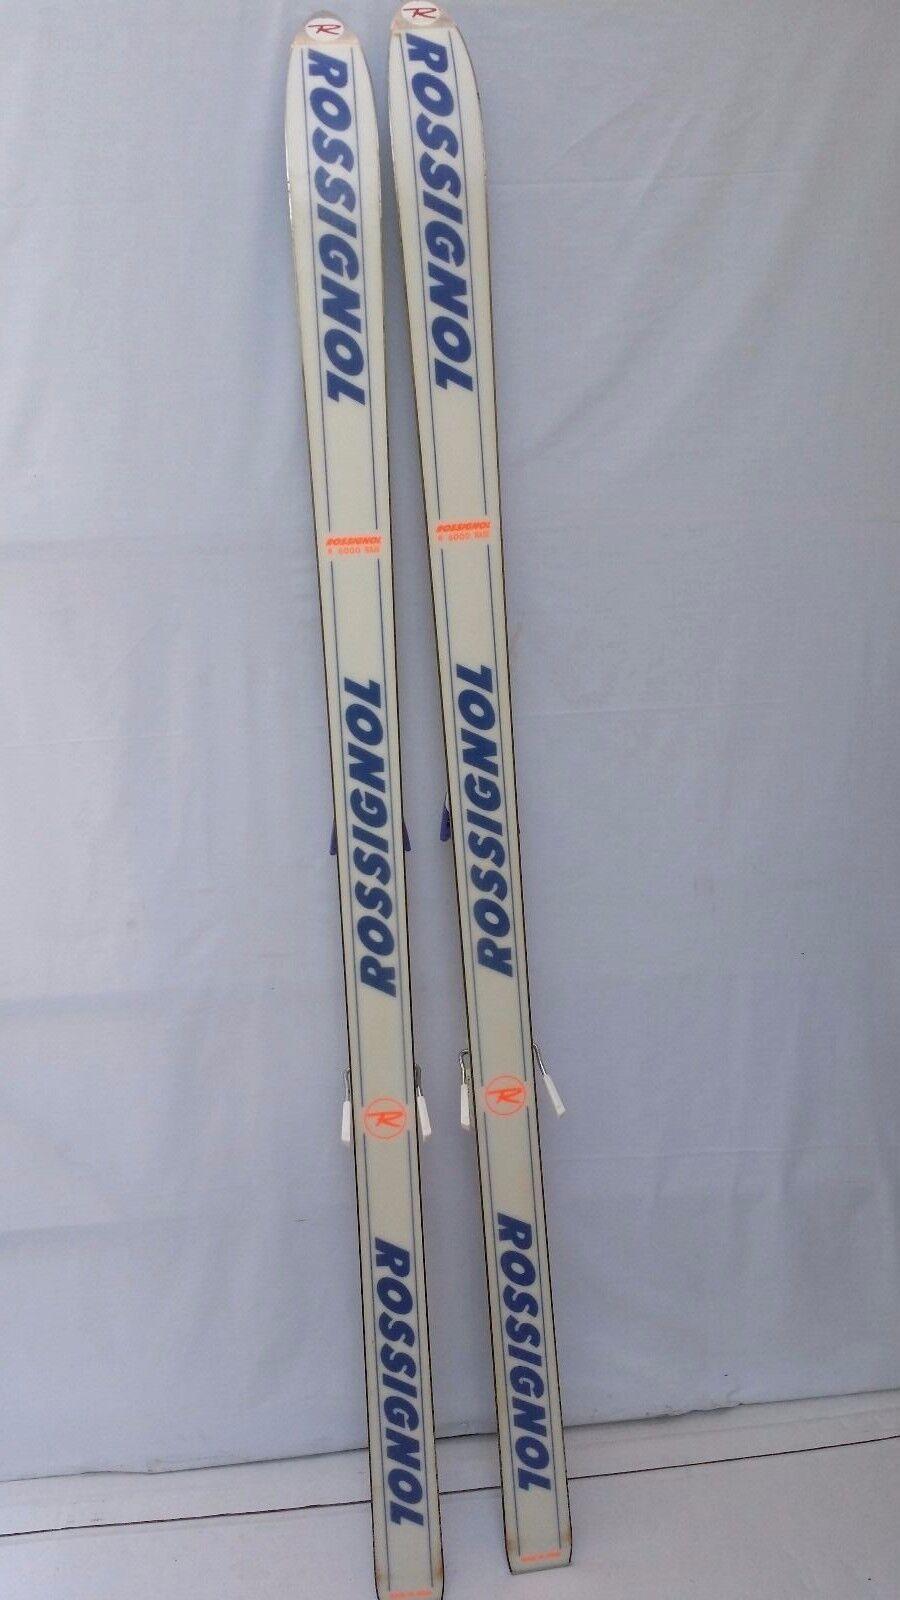 Rossignol R 6000 Base Skis Series 3 with Salomon Quadrax Bindings